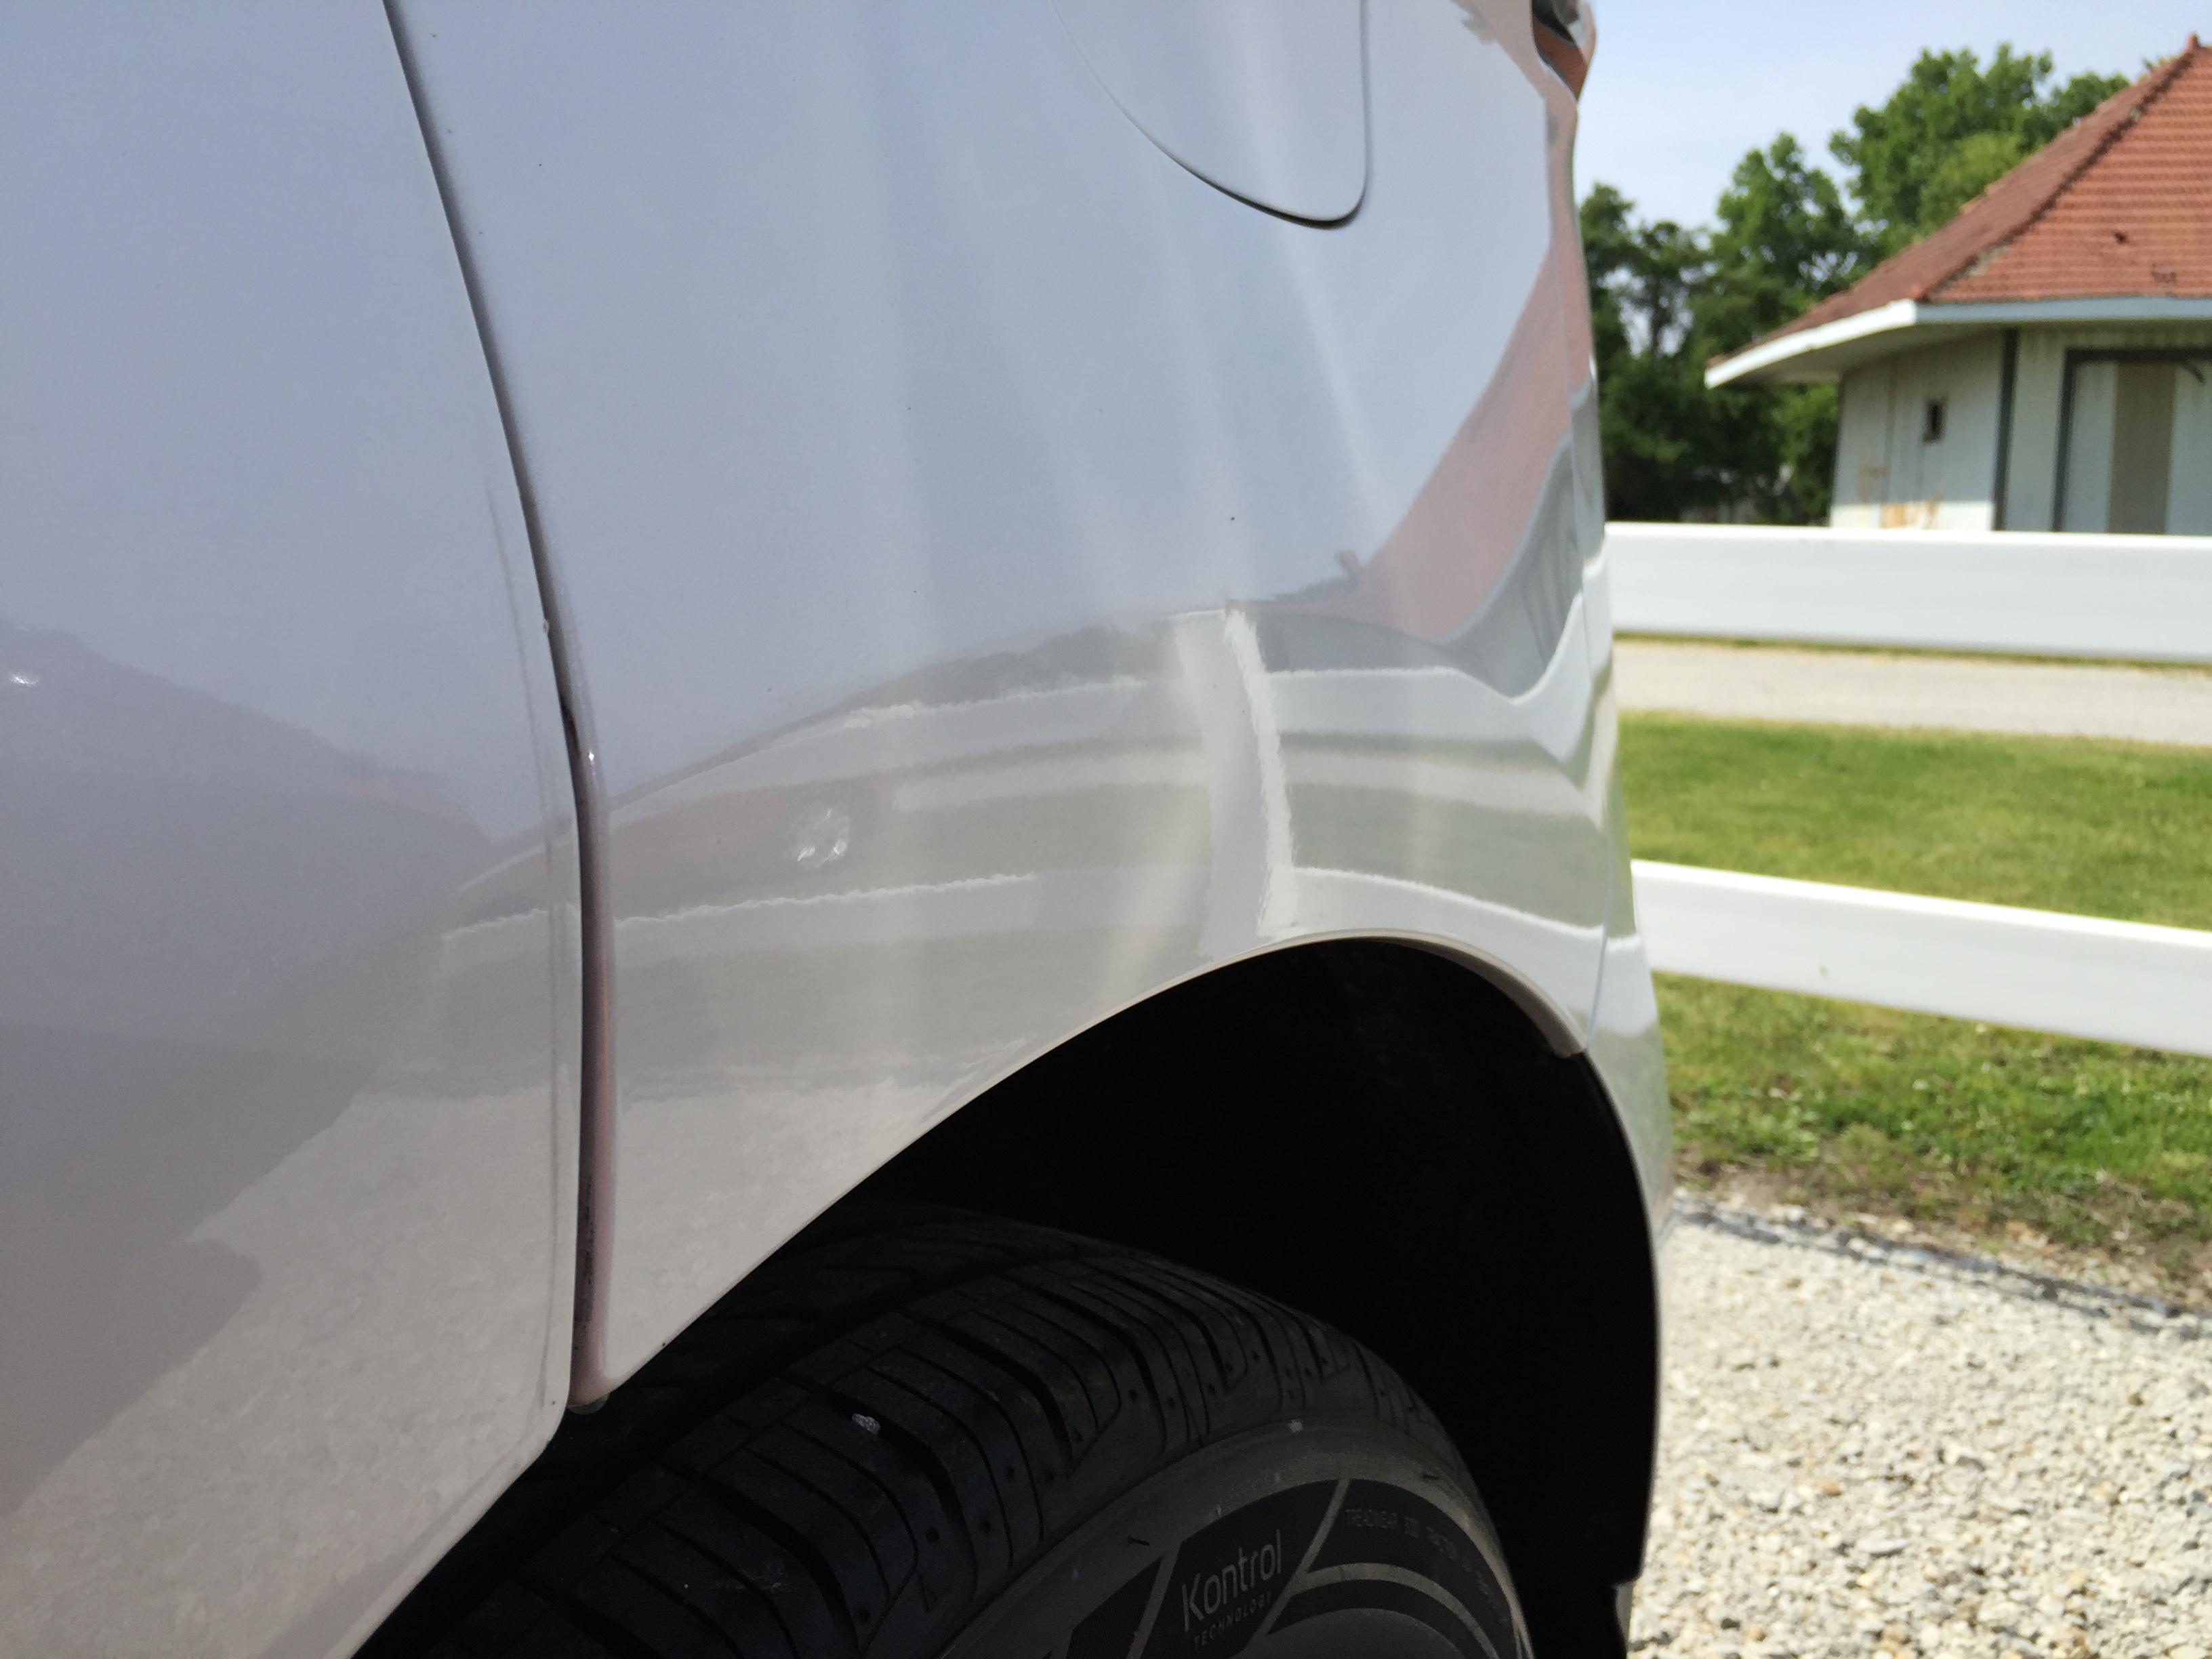 Springfield Dent Repair, Dent Removal, Hail Repair, 2015 Ford Edge Body Line Dent, Repair in Springfield IL, http://217dent.com